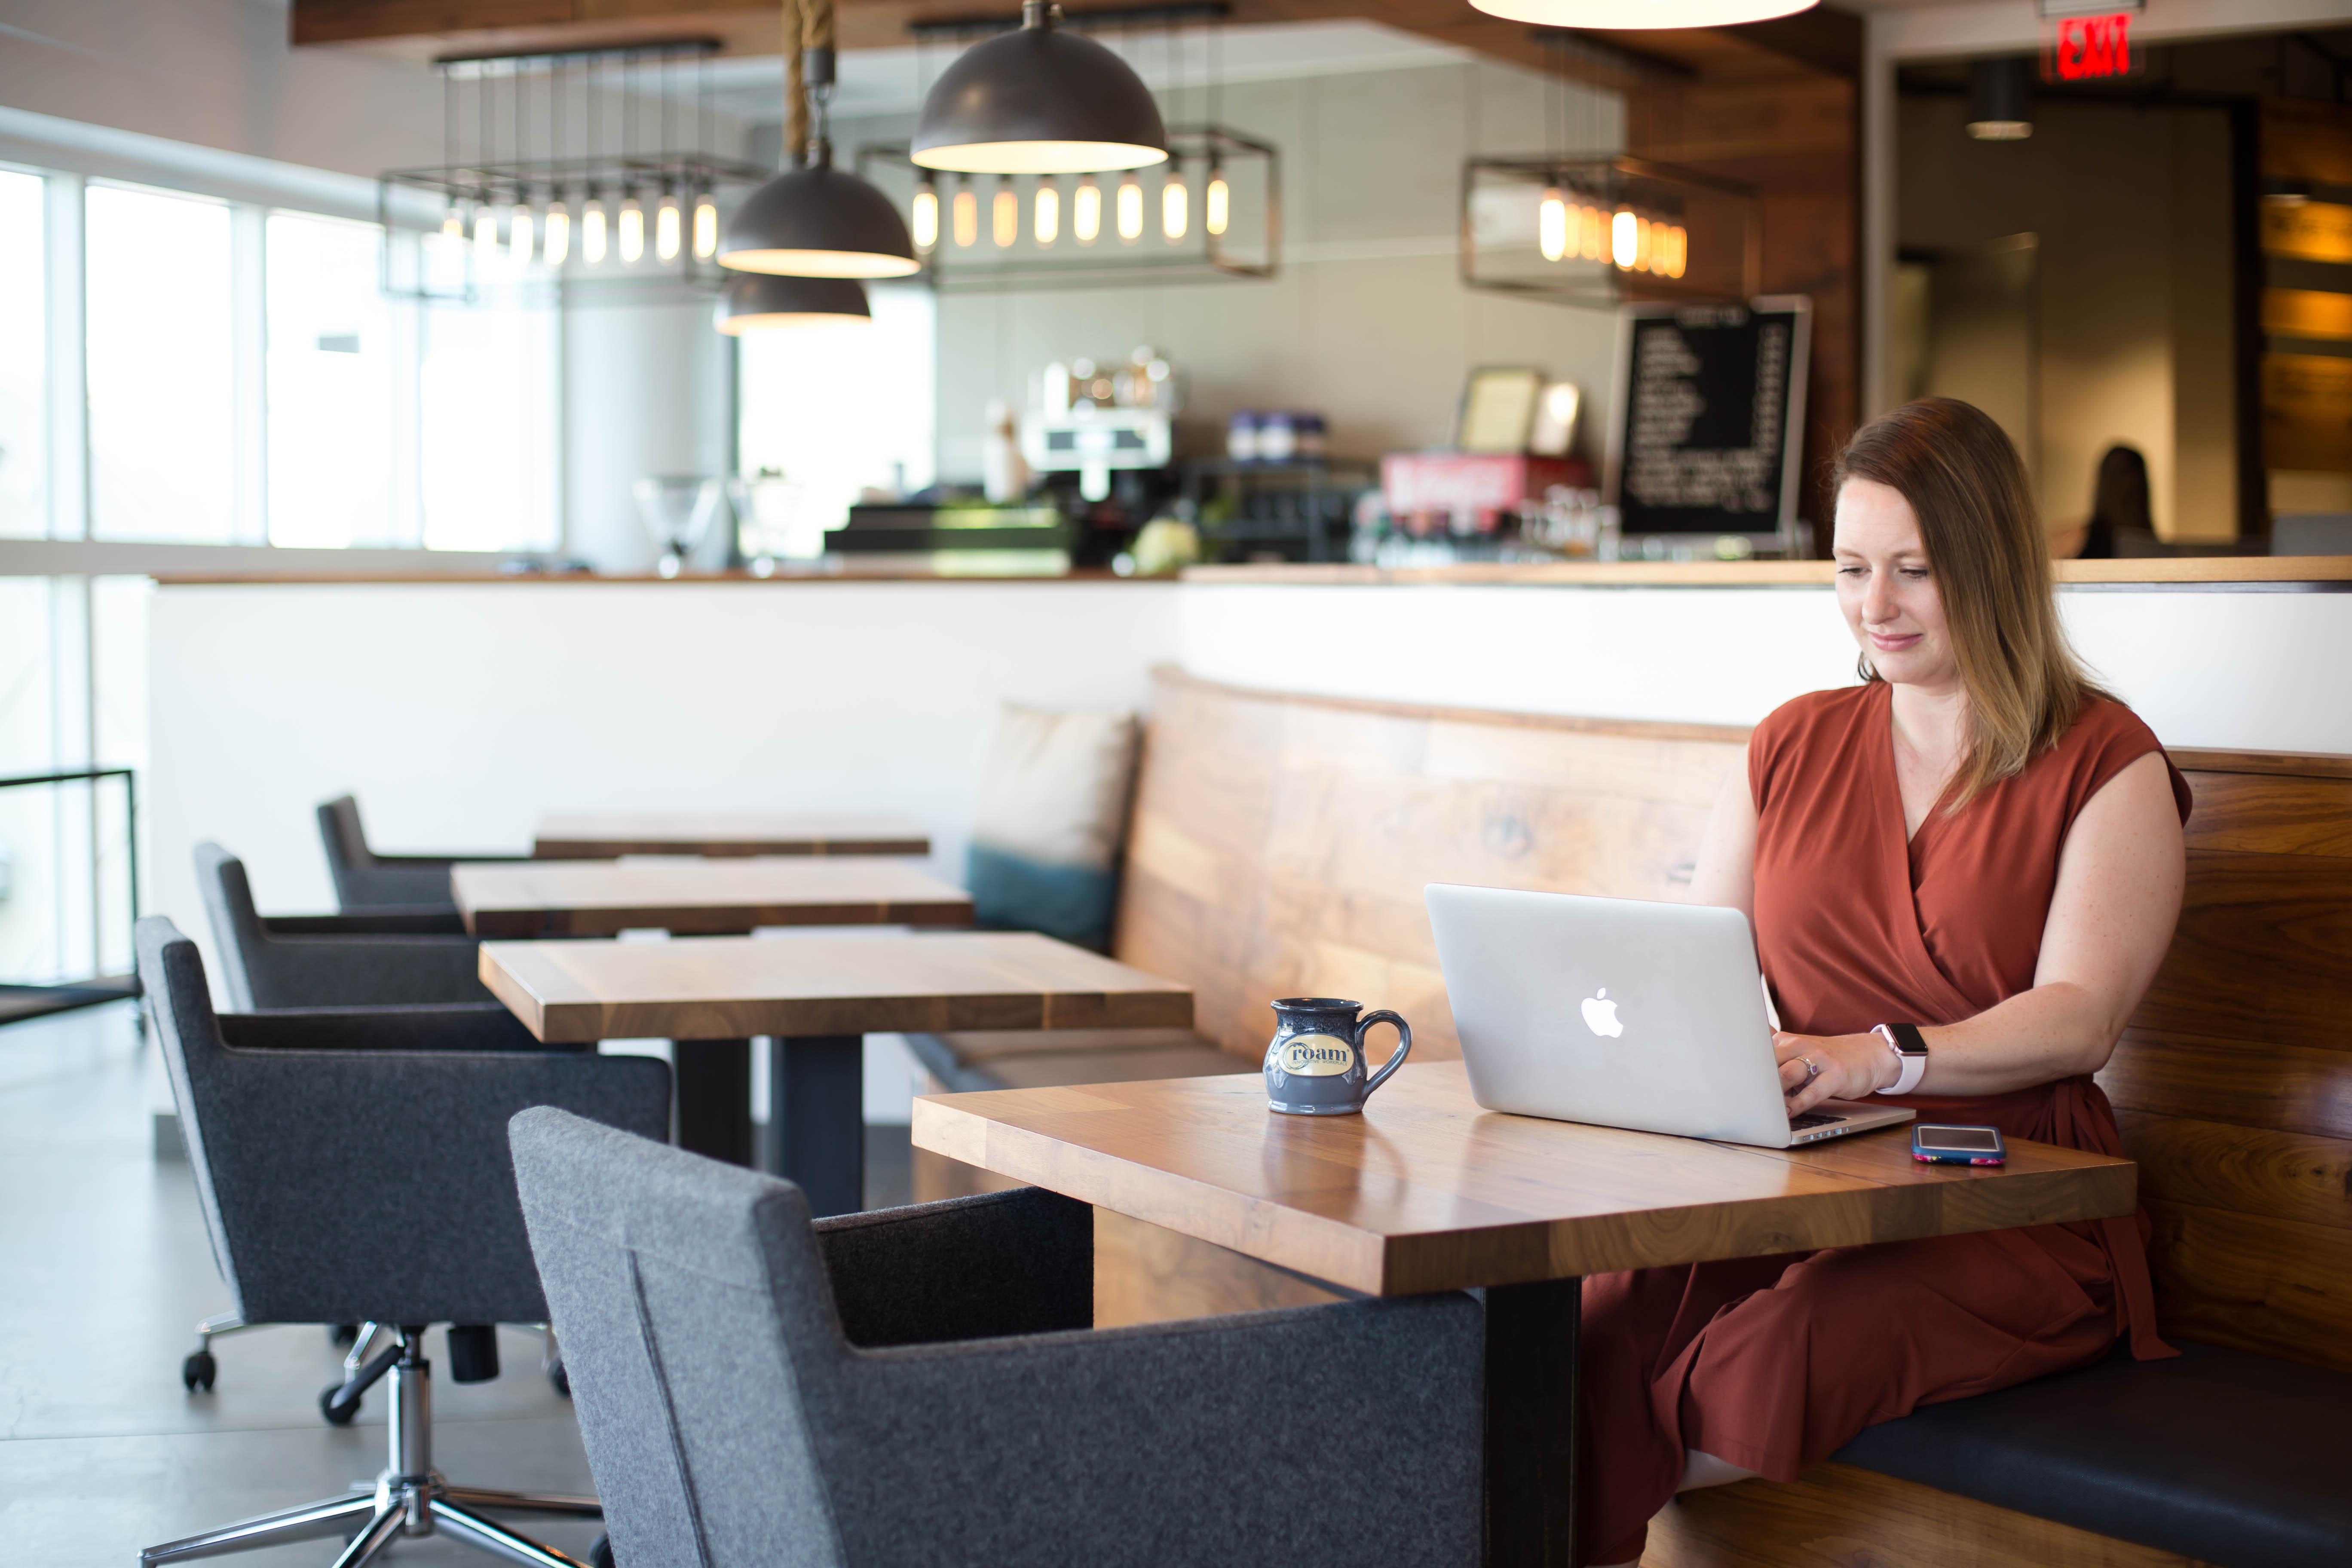 Member working in coworking space